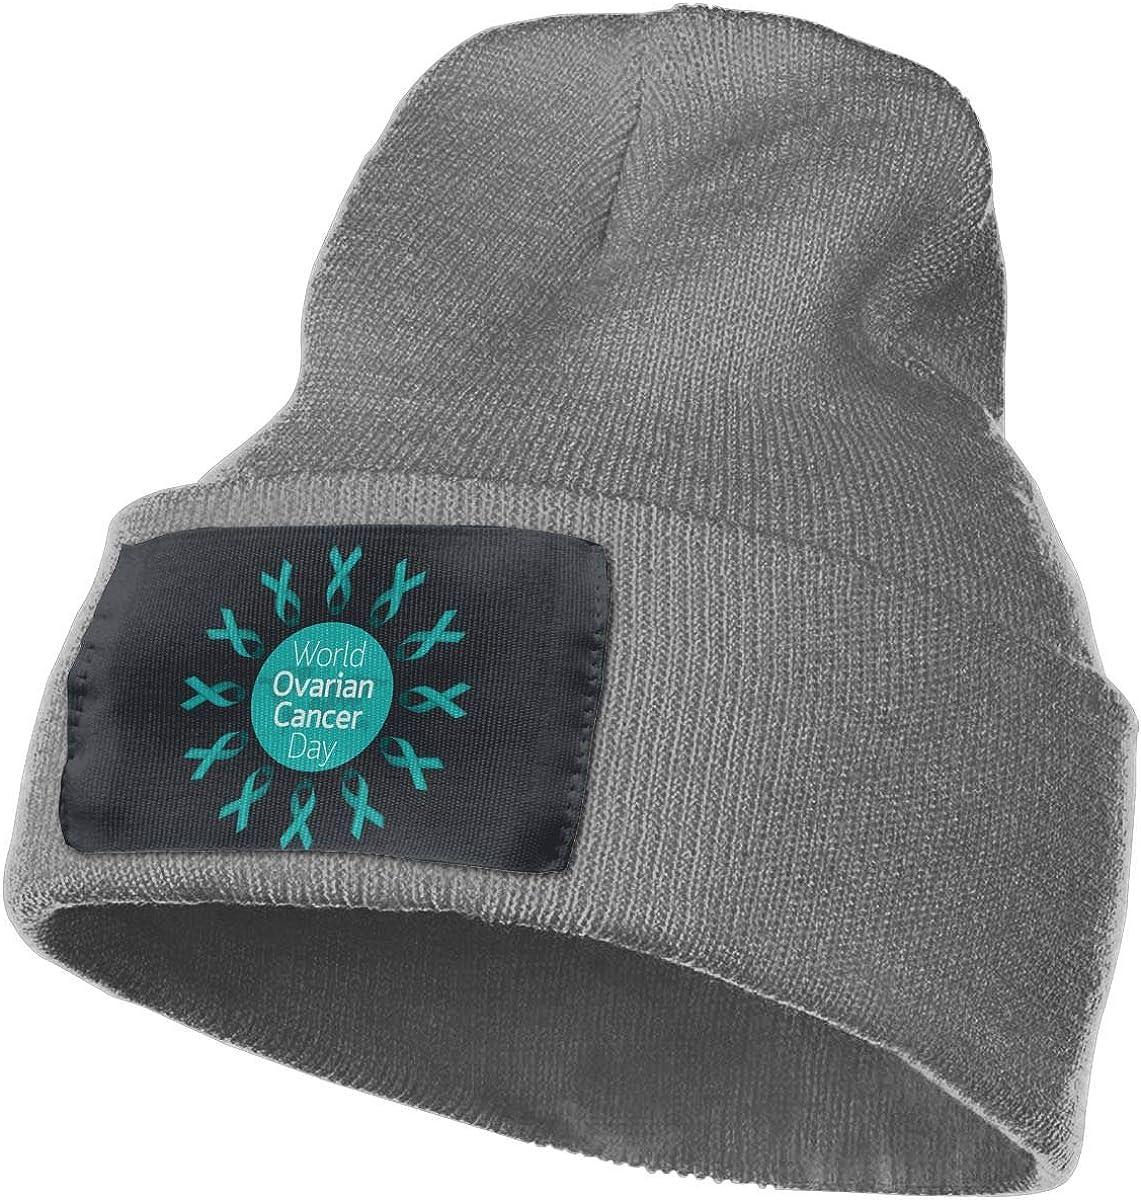 AgnWad Unisex Green Breast Cancer Ribbon Knit Cap Soft Stretch Knit Hat Cap Winter Warmer Knit Cap Winter Warm Knitting Hats